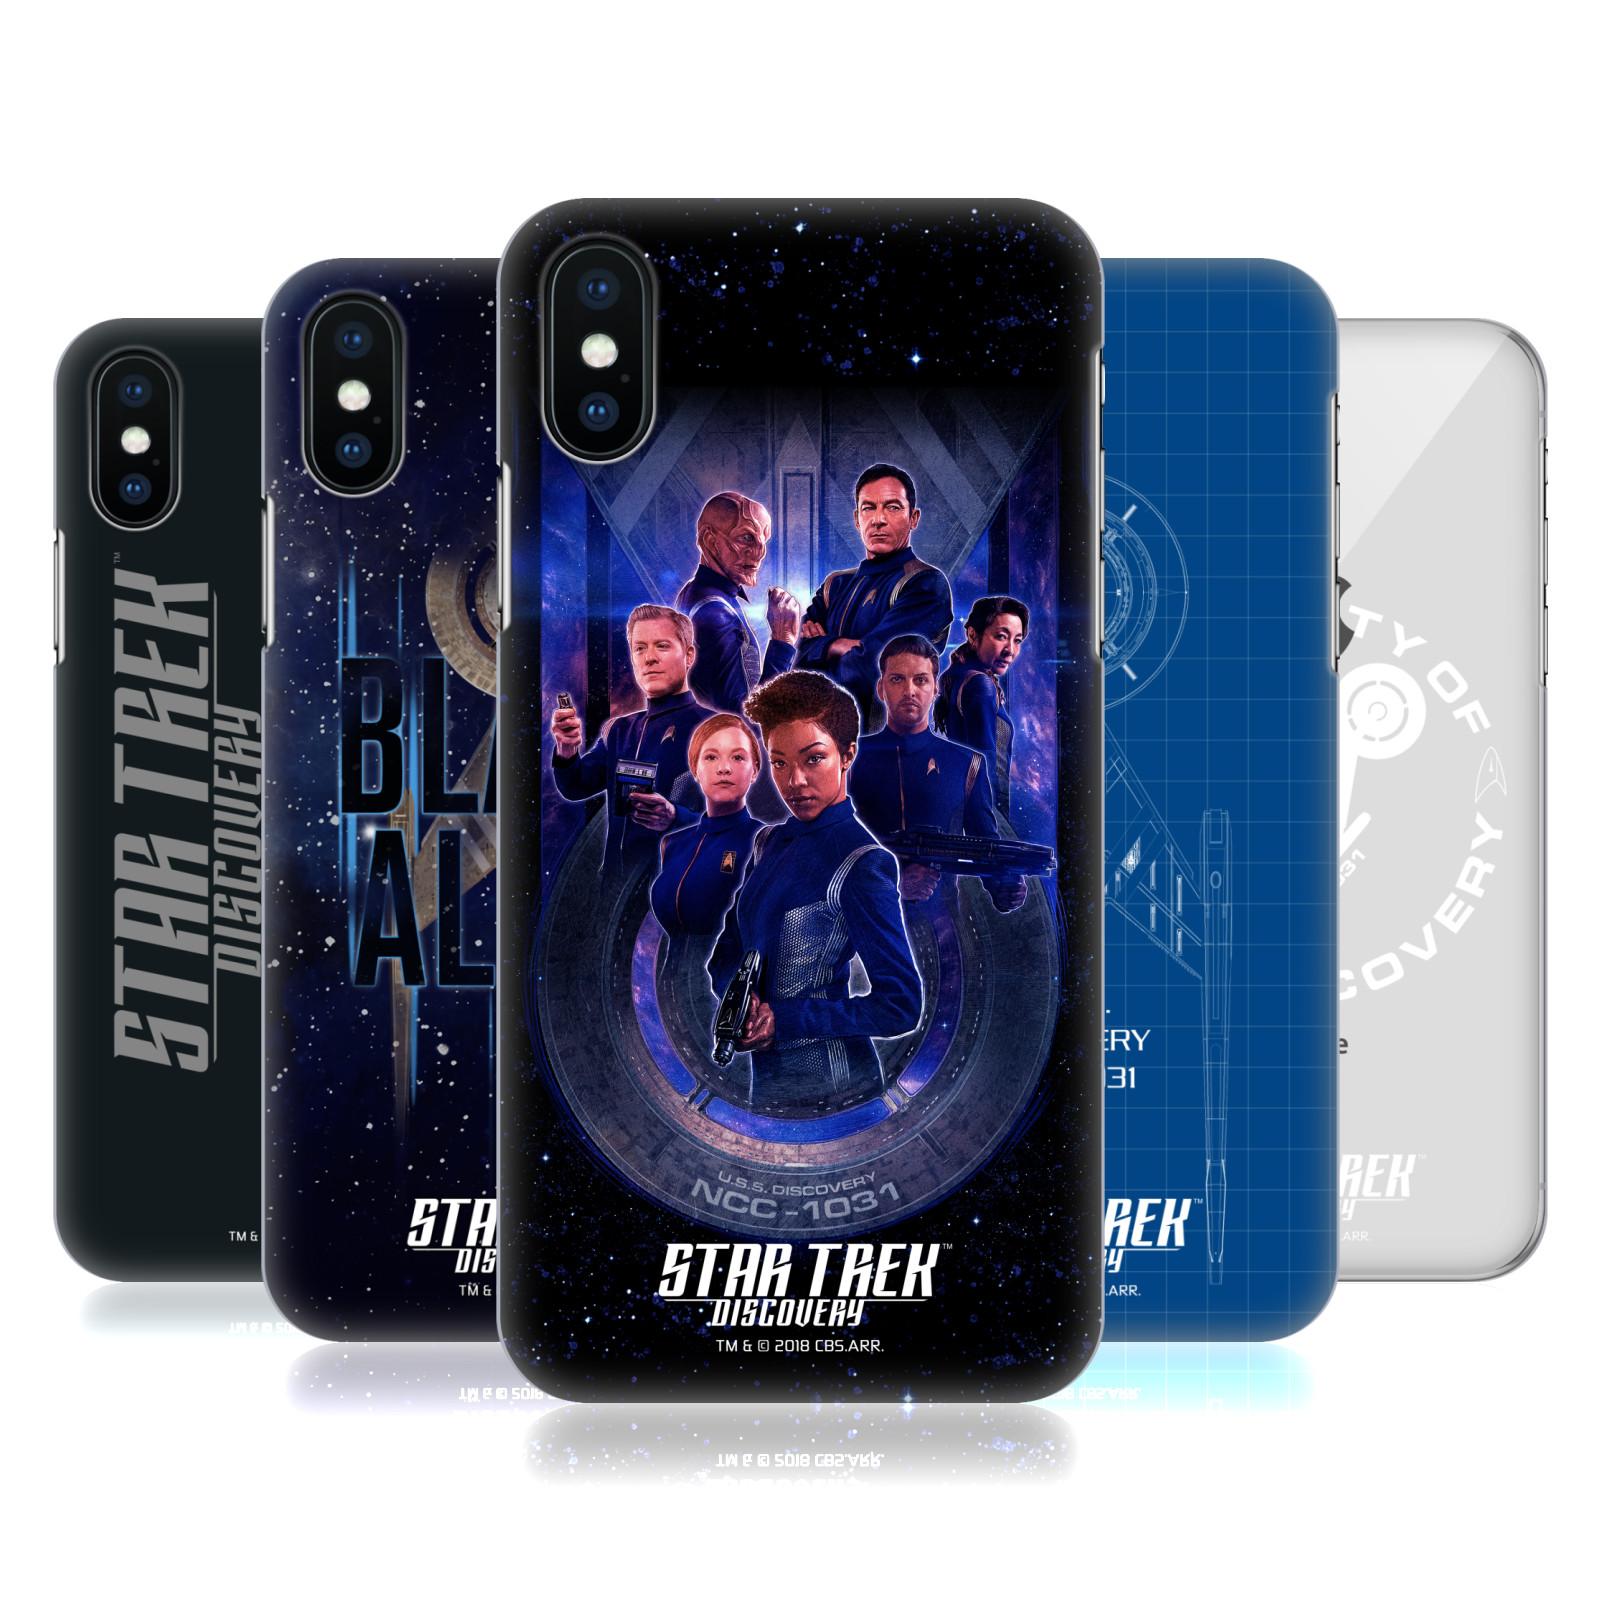 Star Trek Discovery U.S.S Discovery NCC - 1031